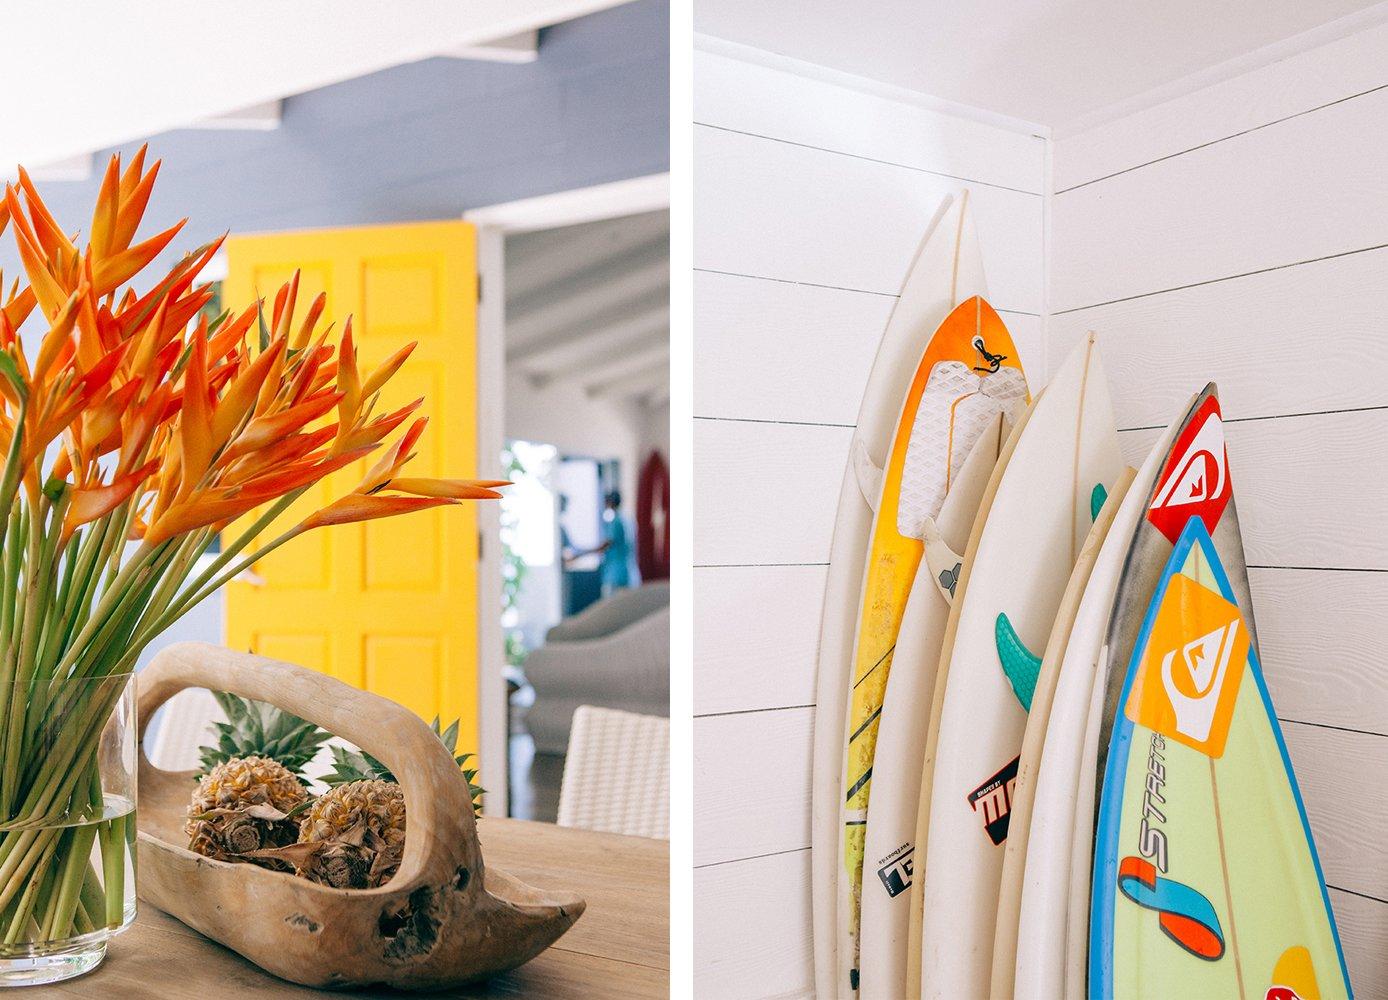 Photo 5 of 8 in Surf Shacks 014 - Raimana Van Bastolear